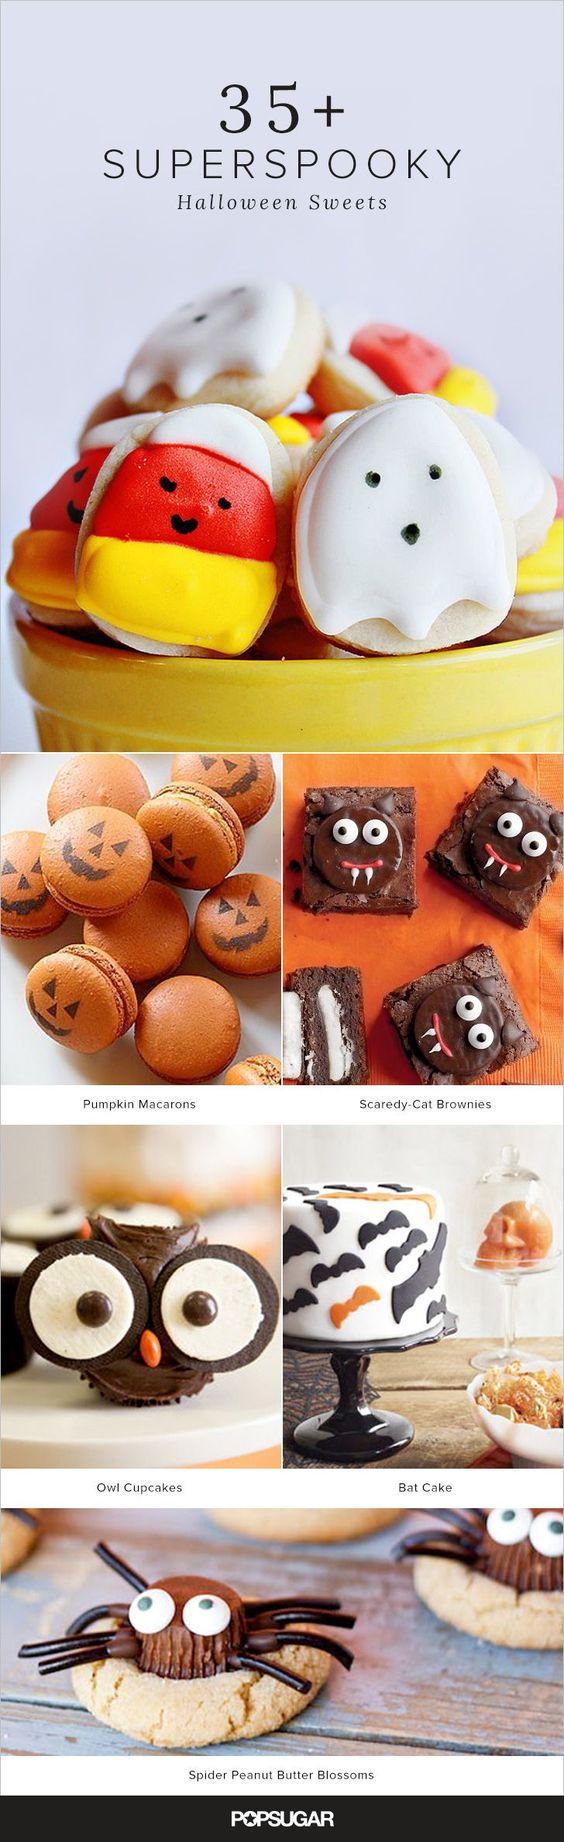 37 scarily cute halloween sweets creative halloween for Creative ideas for halloween treats